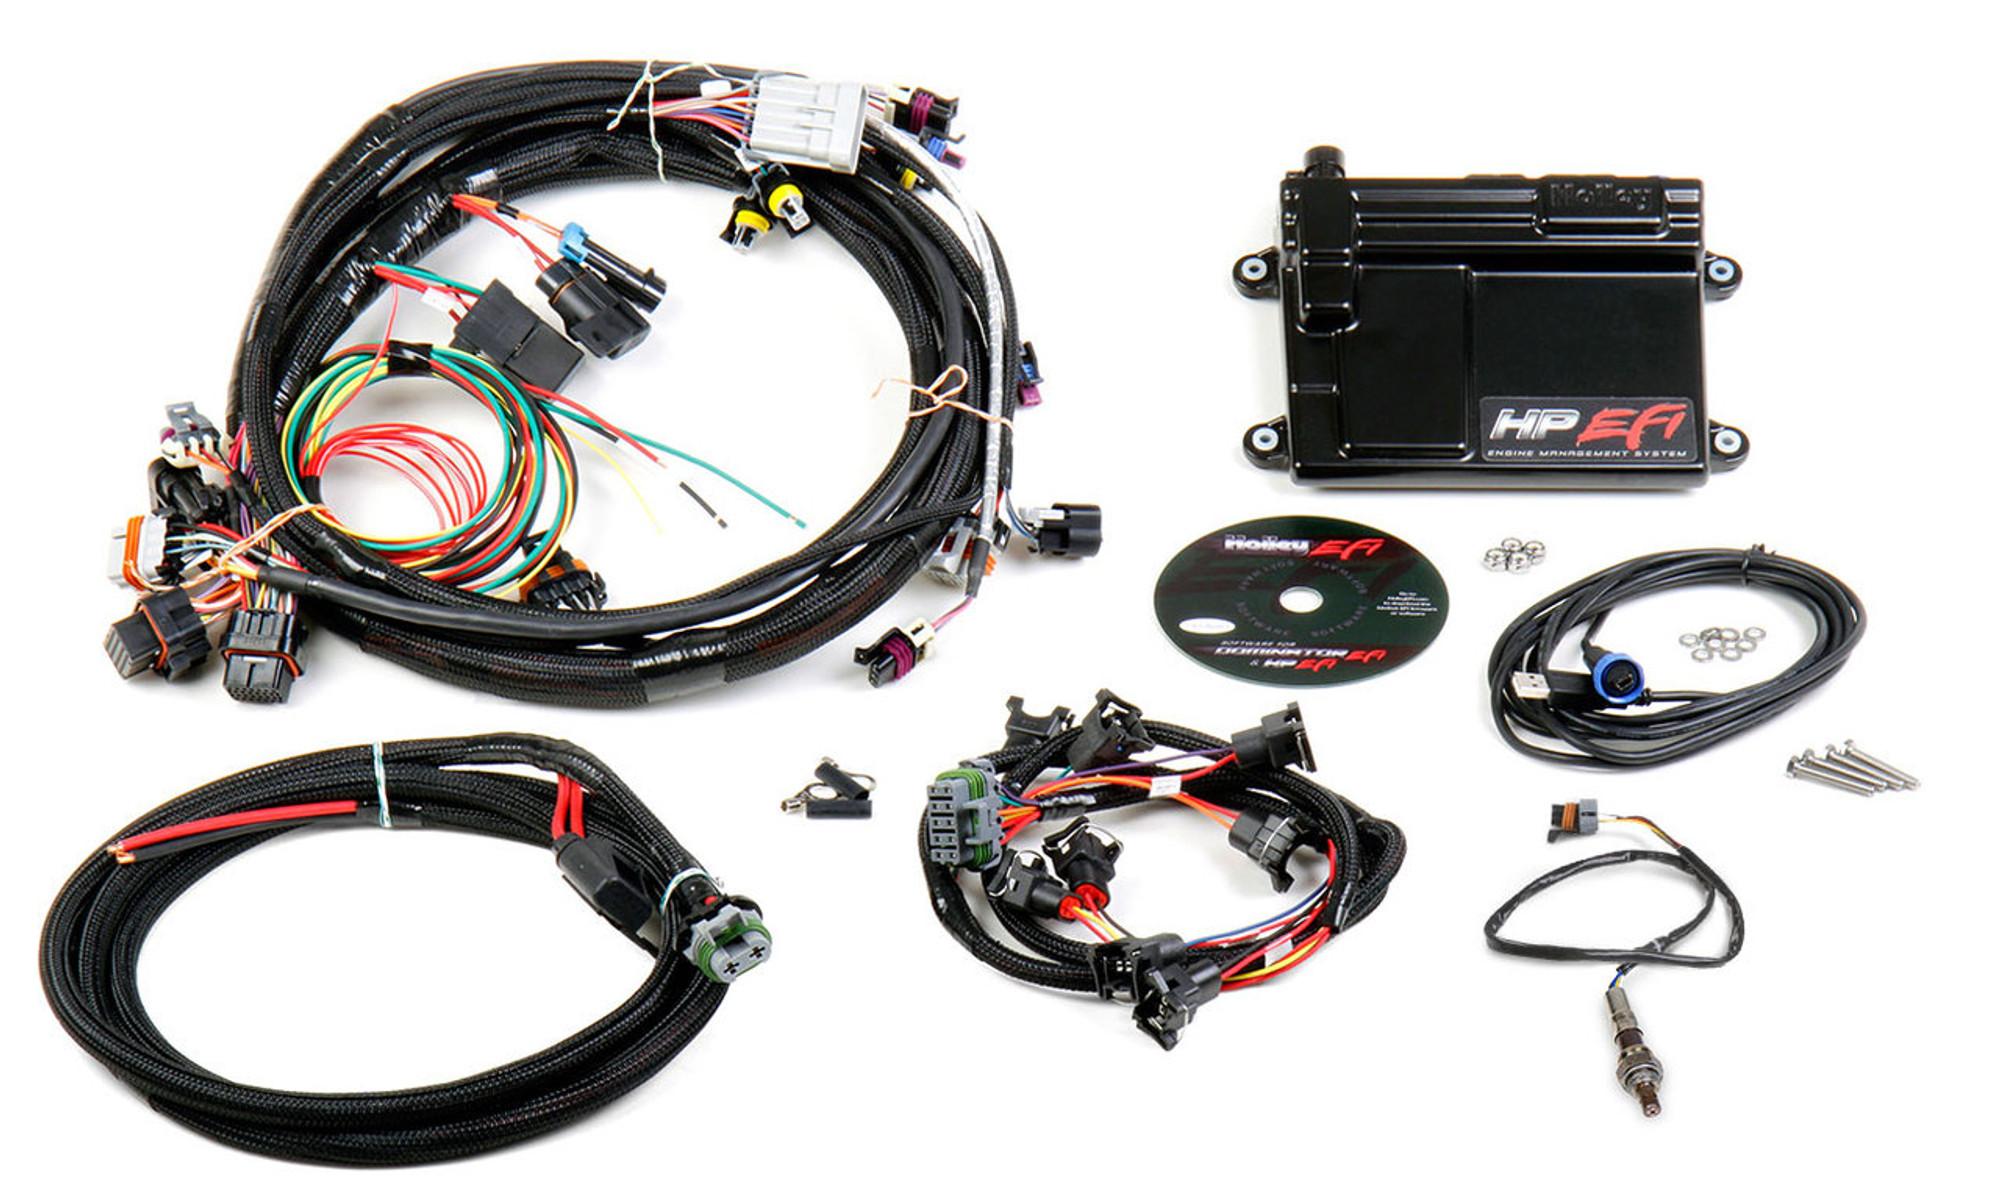 5 3 wiring harness and computer wiring diagram progresif rh 17 wer winter session de